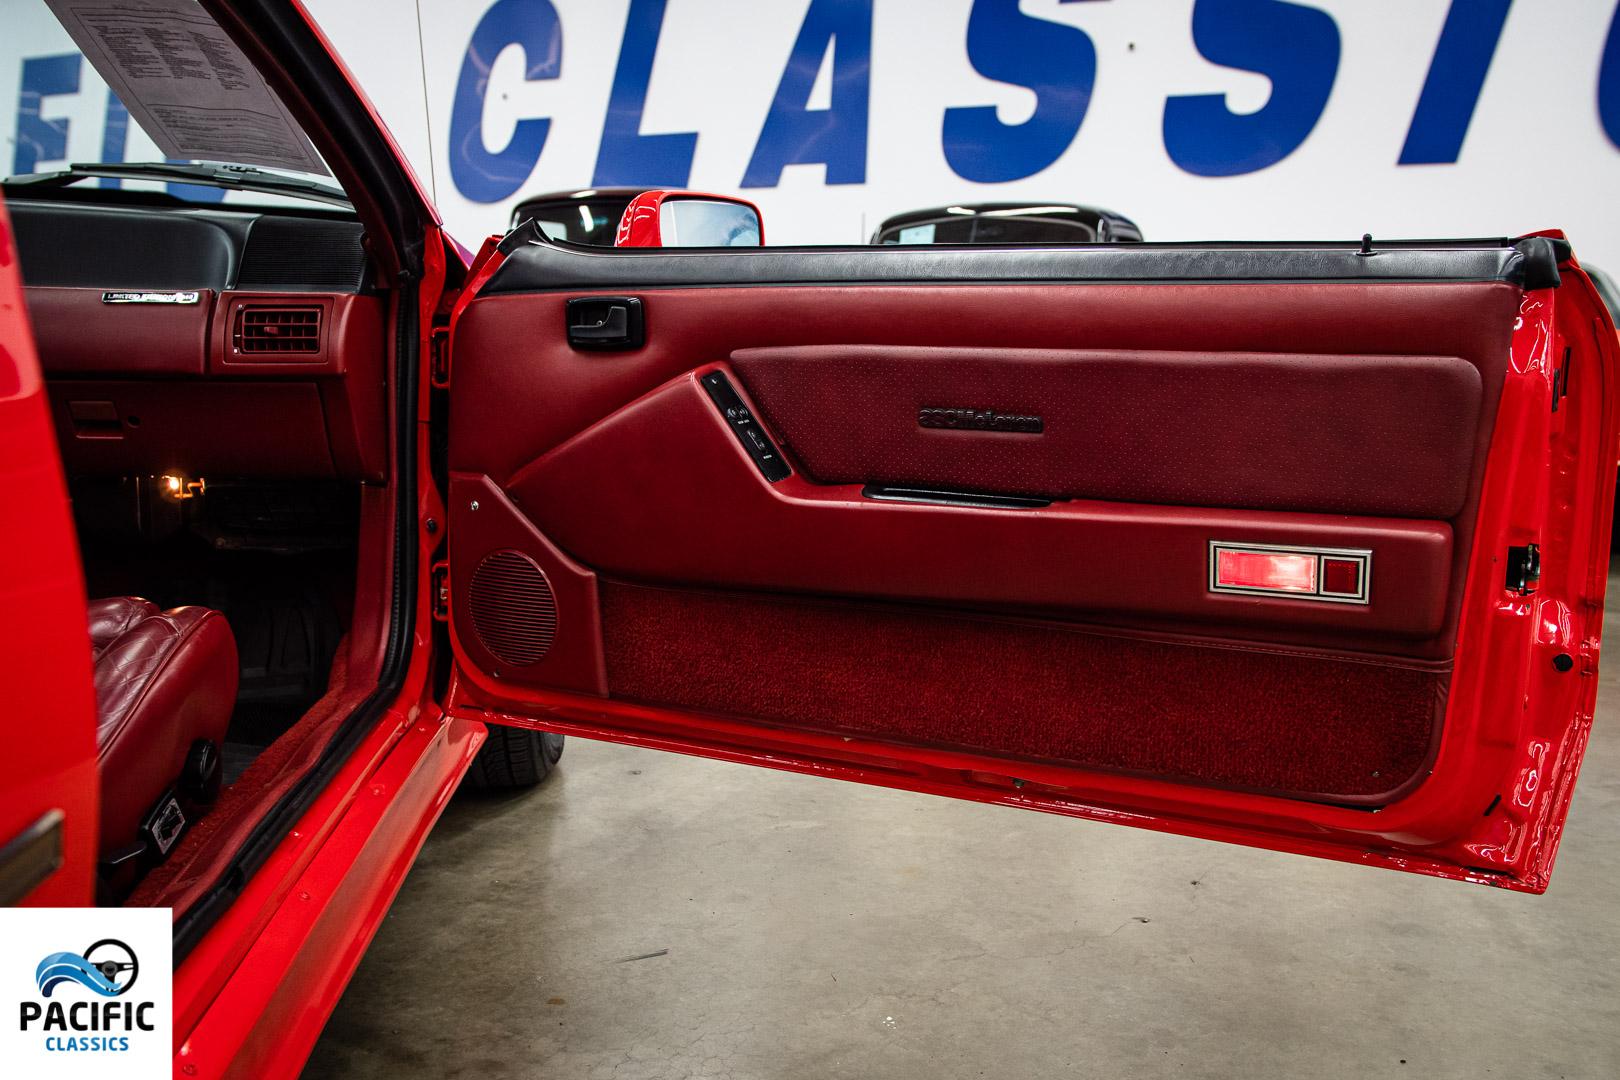 1988 ASC McLaren Mustang